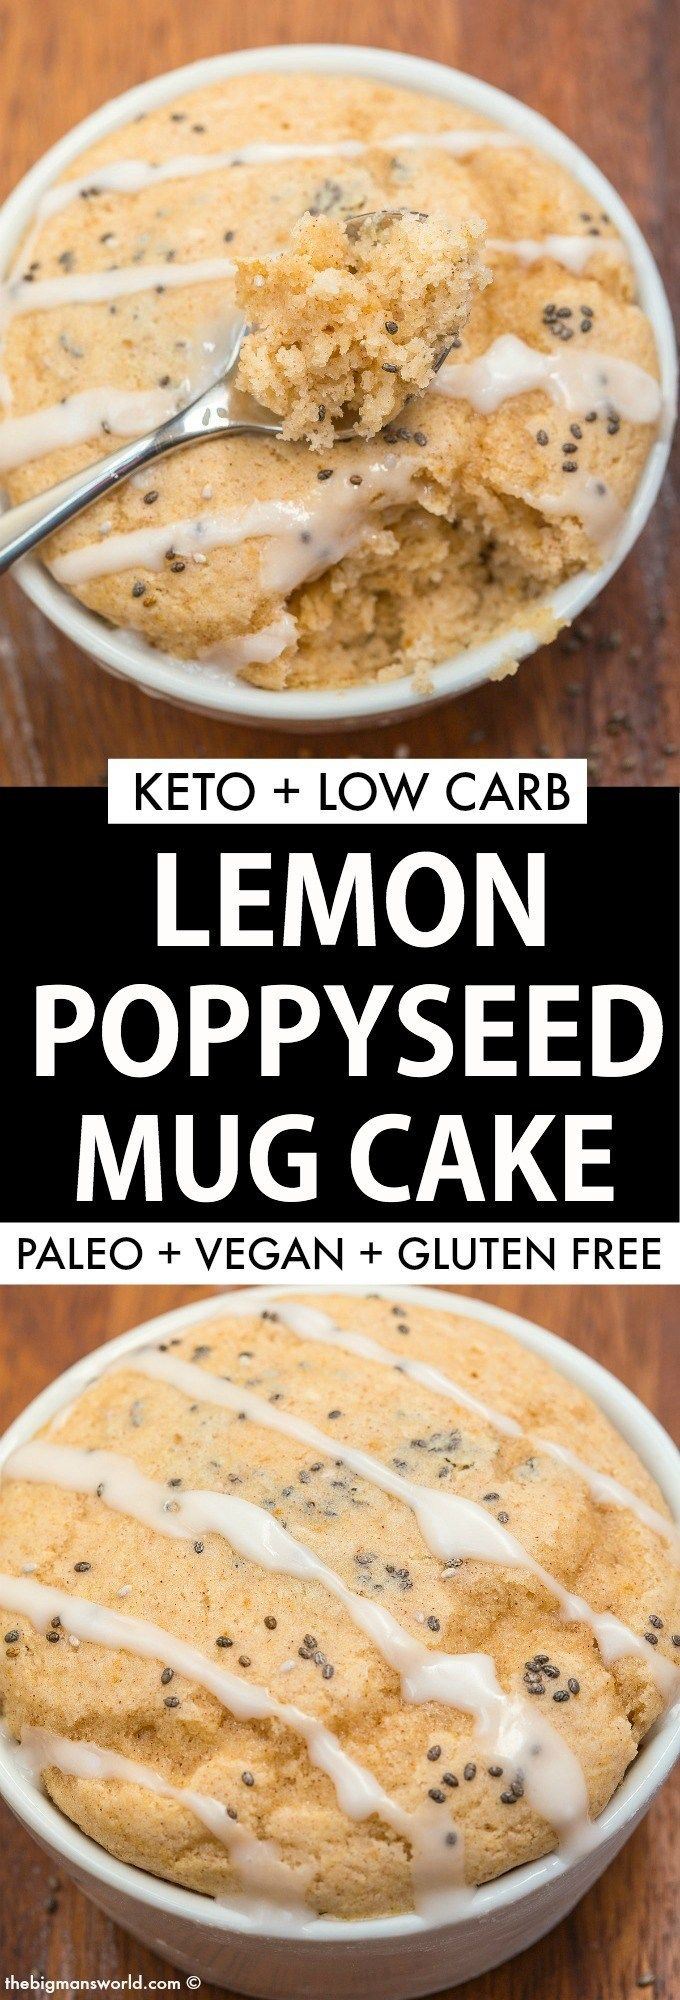 Healthy Cake Keto